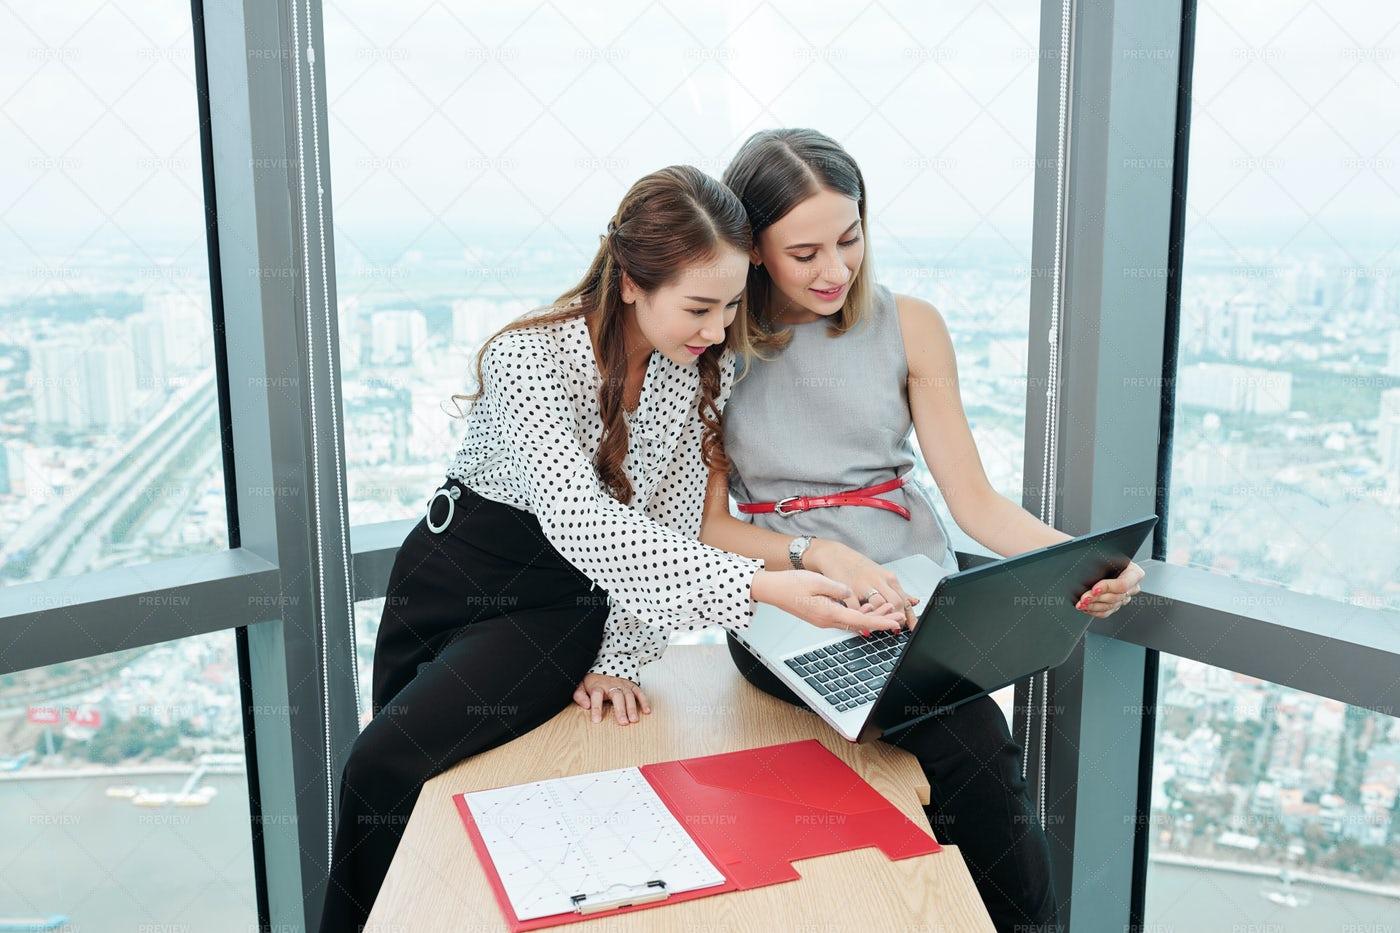 Businesswoman Working In Modern Office: Stock Photos